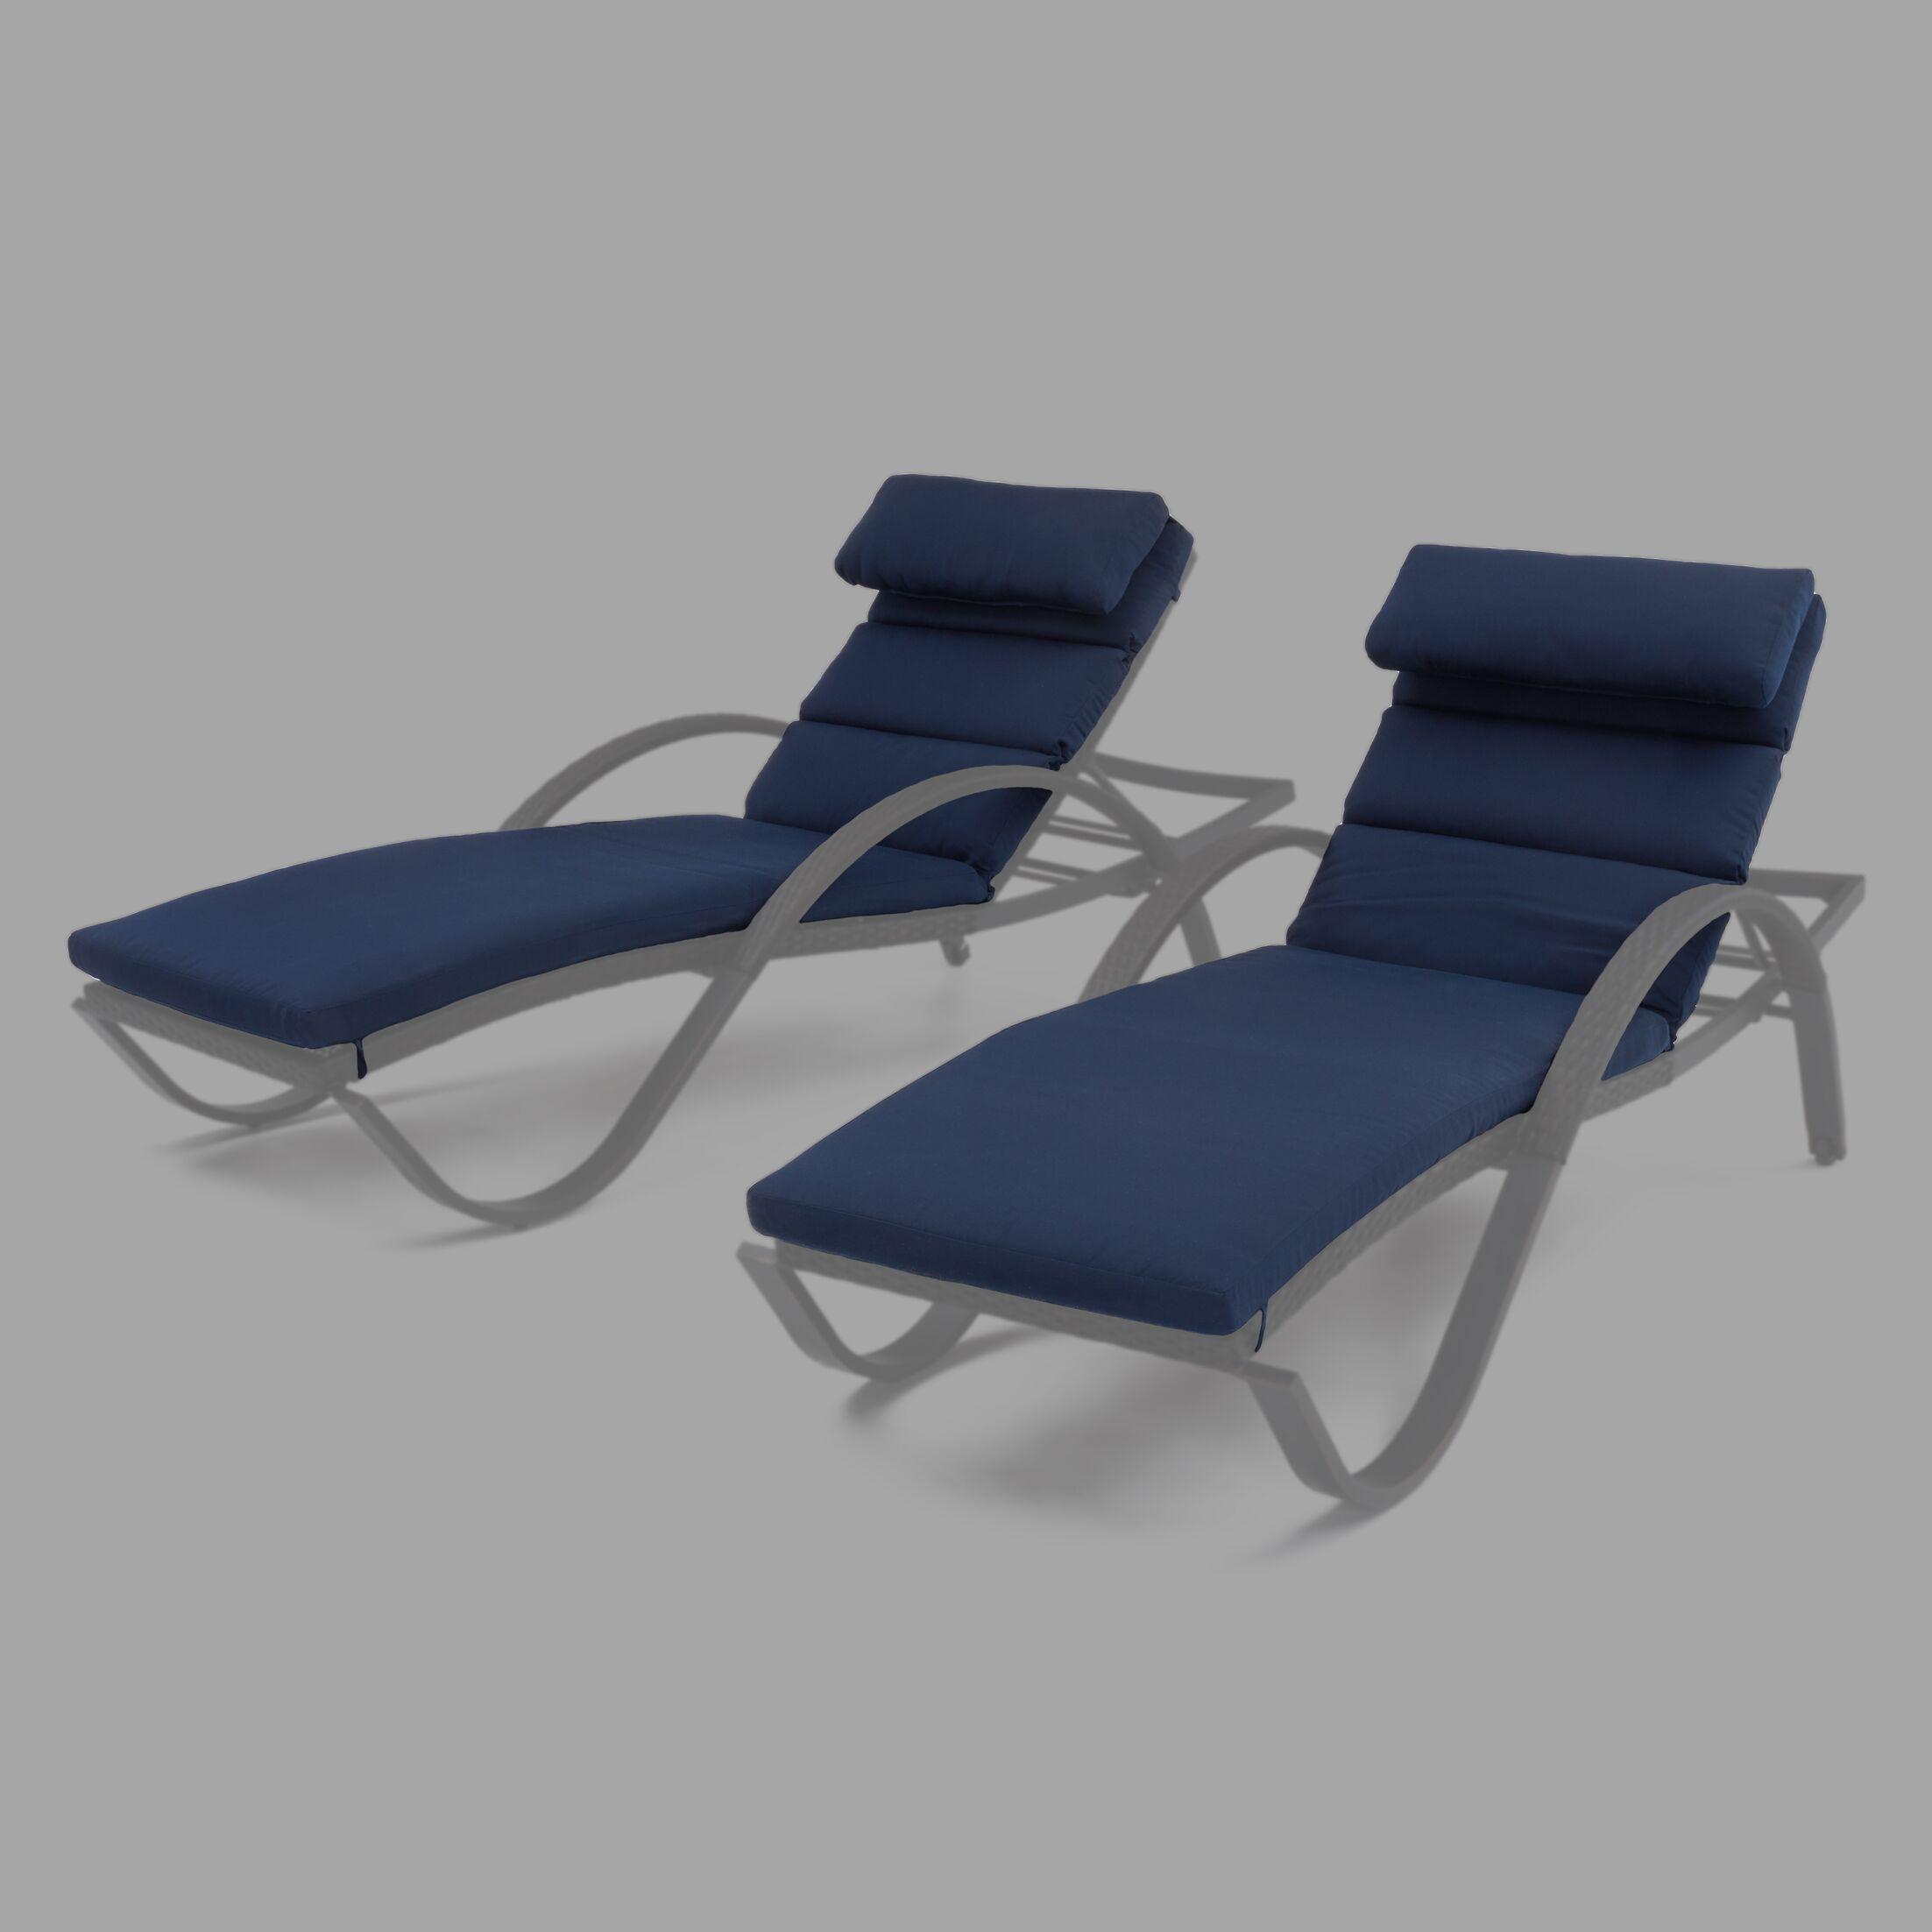 Northridge Outdoor Sunbrella Chaise Lounge Cushions Fabric: Navy